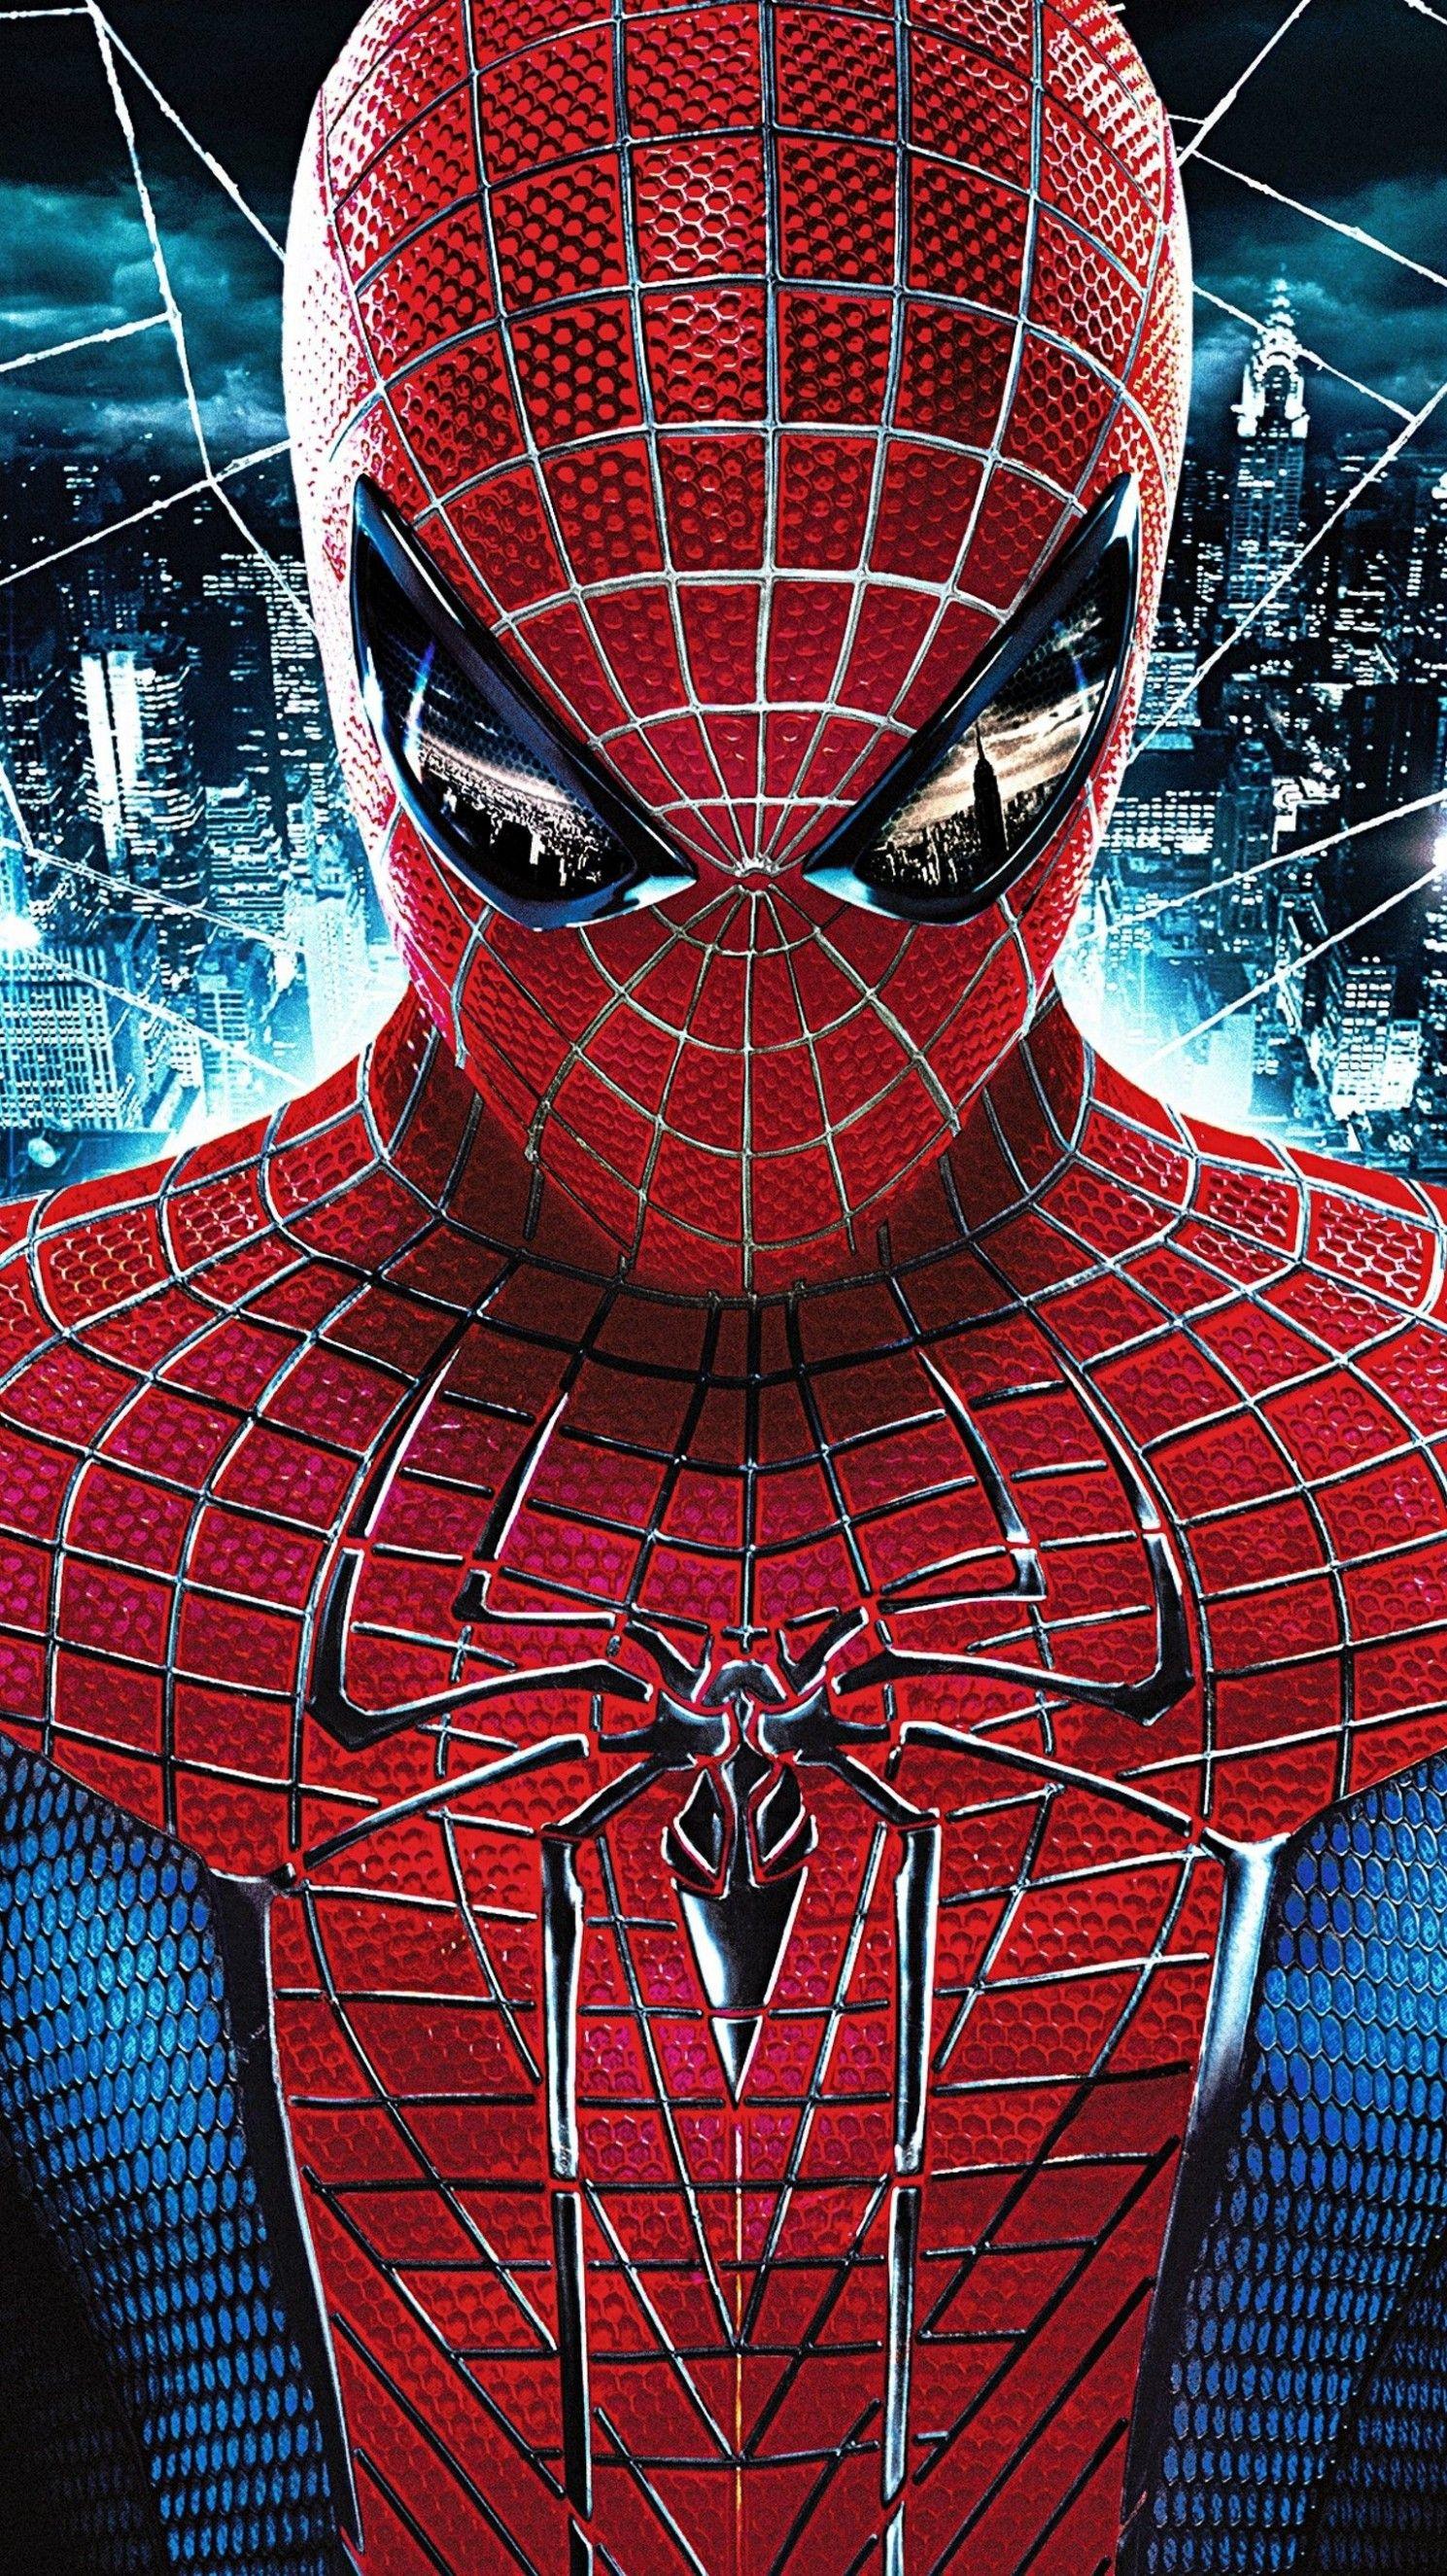 13 Awesome Things You Can Learn From Spiderman Wallpaper Fotos Del Hombre Arana Dibujo Del Hombre Arana Hombre Arana Animado